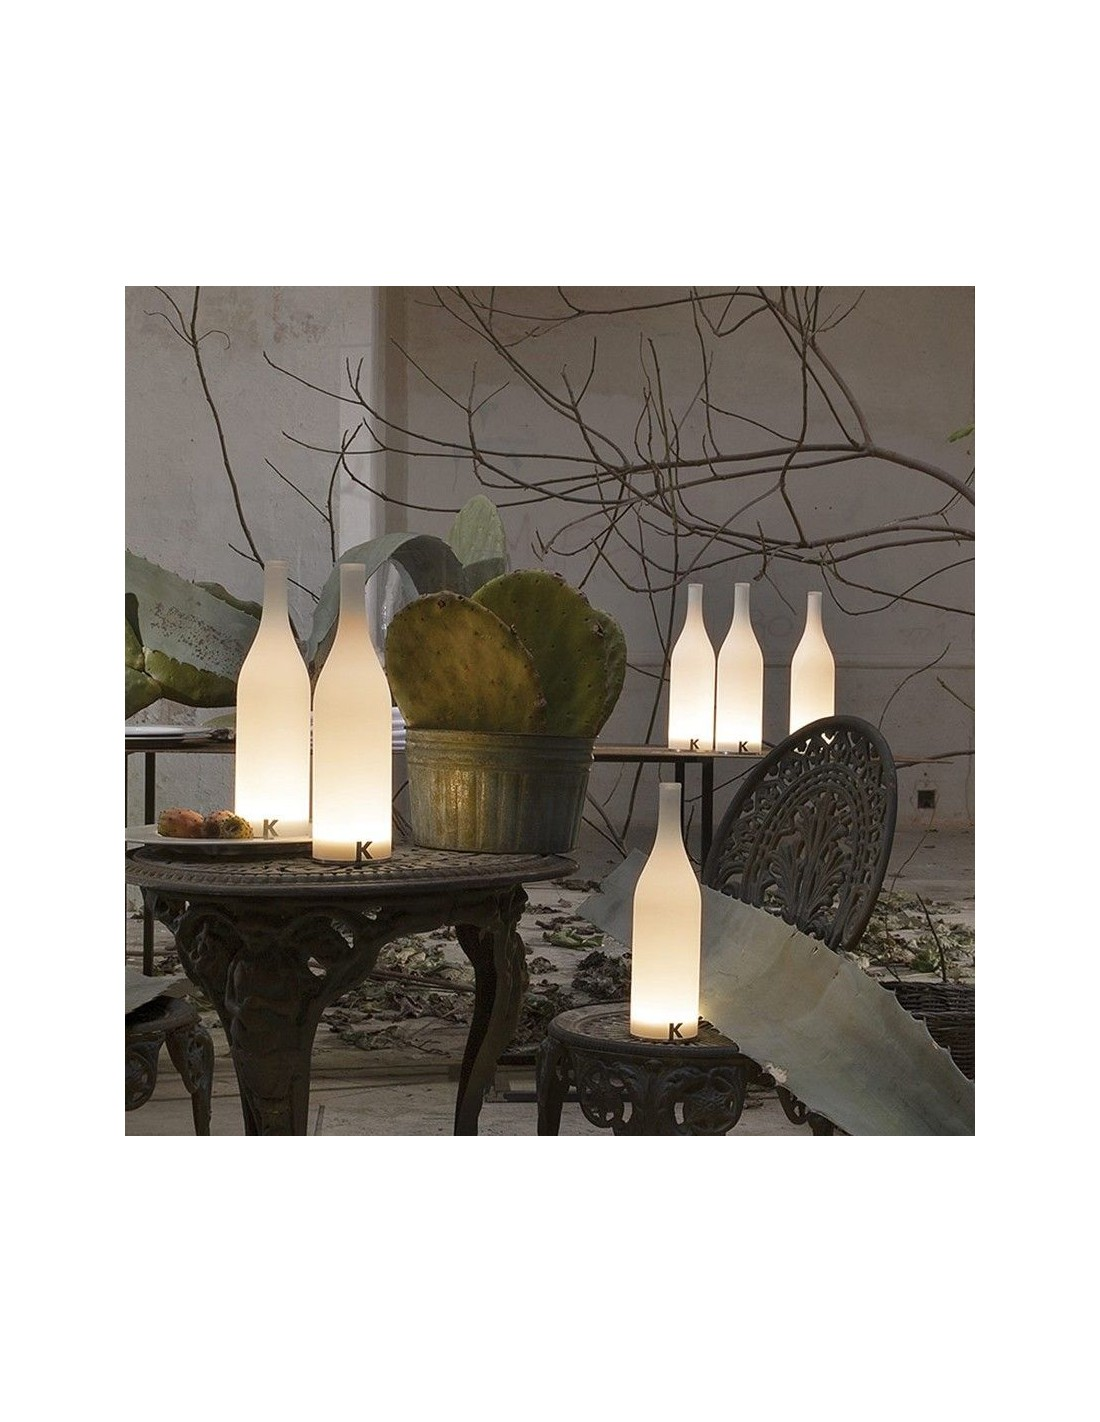 lampe poser sans fil bacco ambiance show room de chez karman. Black Bedroom Furniture Sets. Home Design Ideas